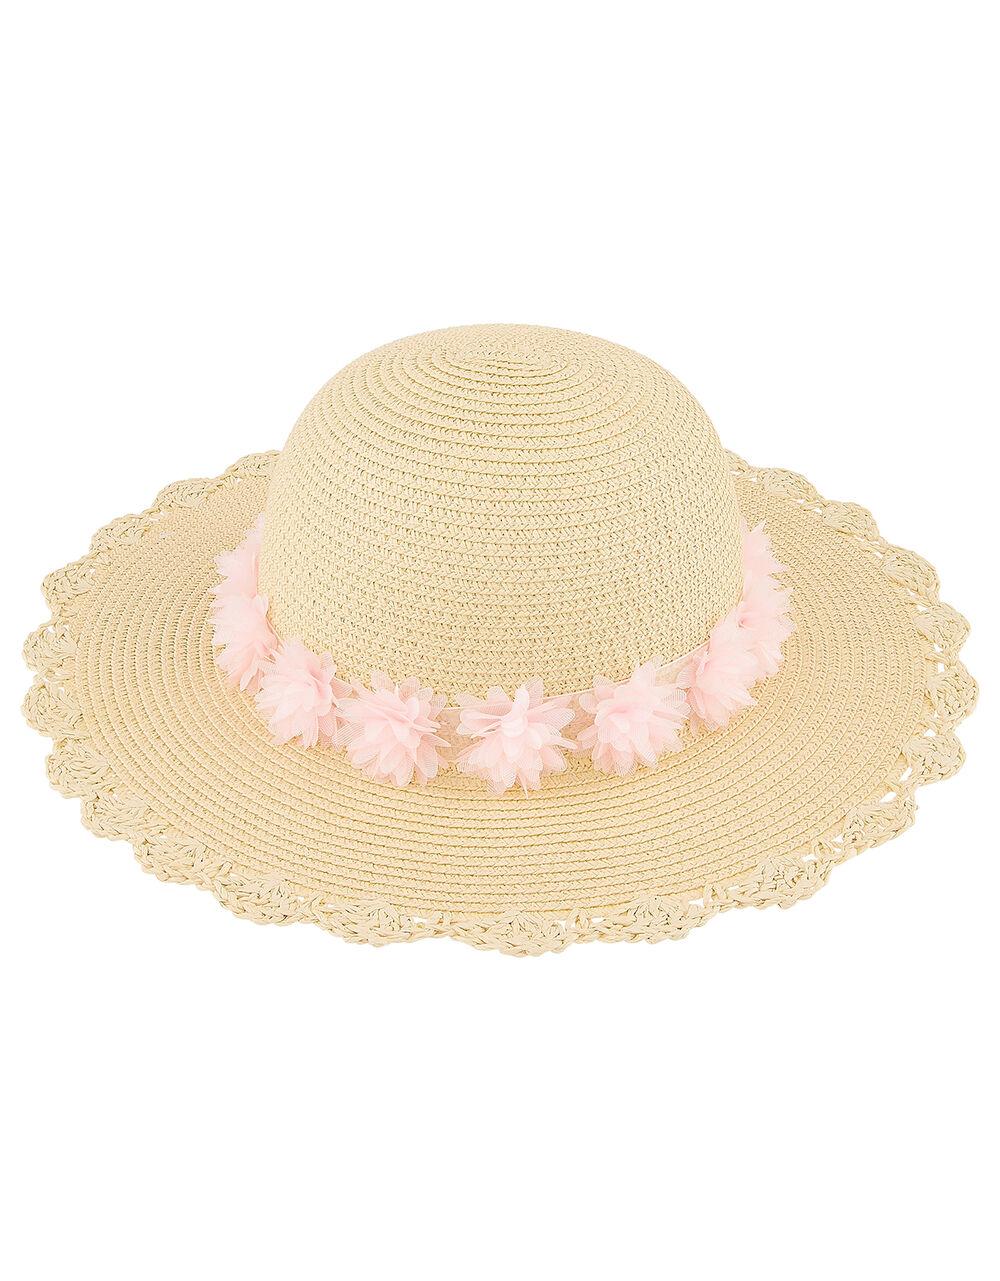 Macaroon Flower Floppy Hat, Natural (NATURAL), large